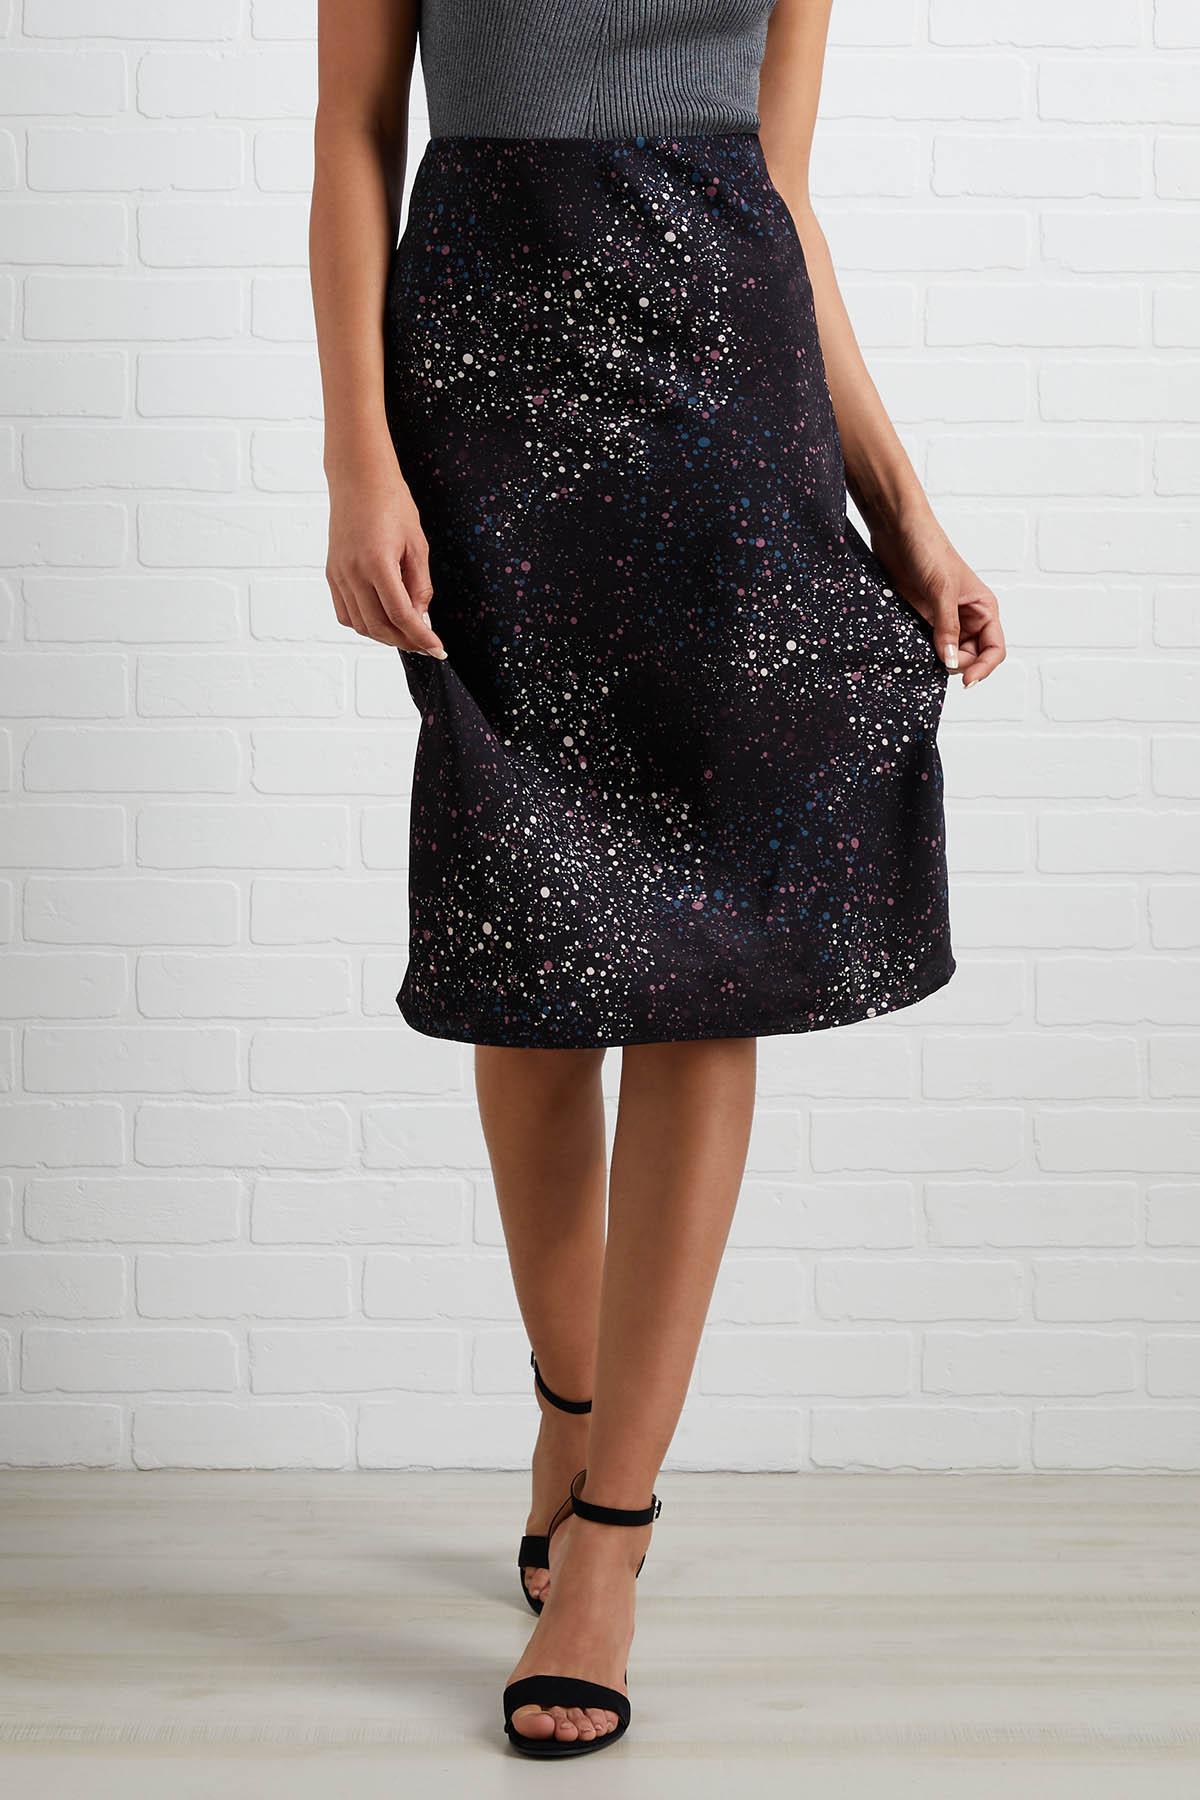 Painted Love Skirt